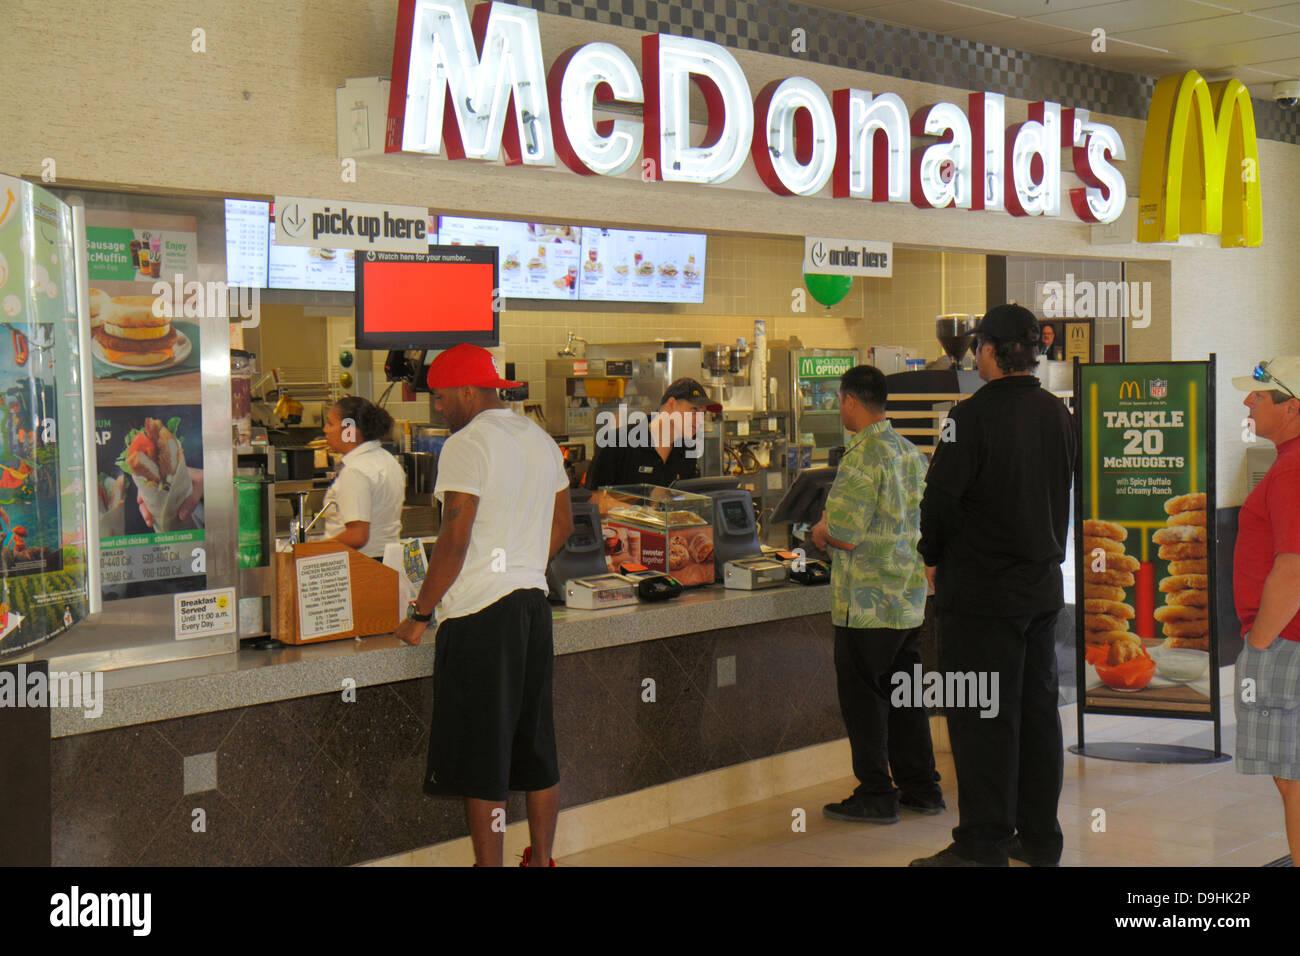 Biggest Fast Food Chain In Russia